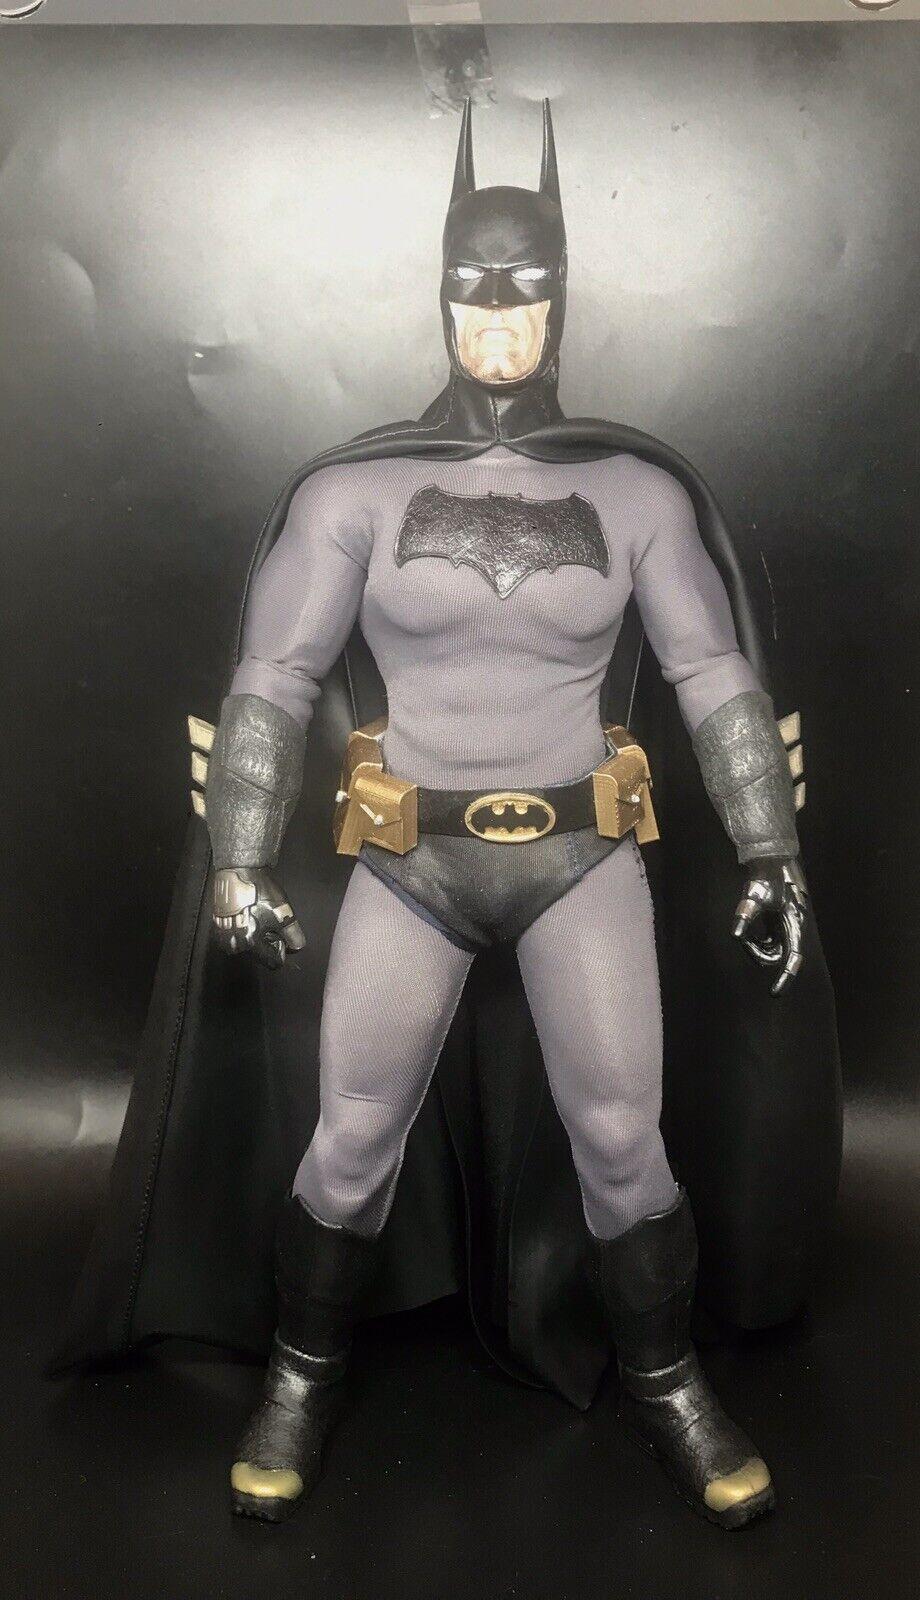 Escala 1 6 figura Personalizada Batman Mash Caballero Oscuro Hot Juguetes TTM20 Cuerpo